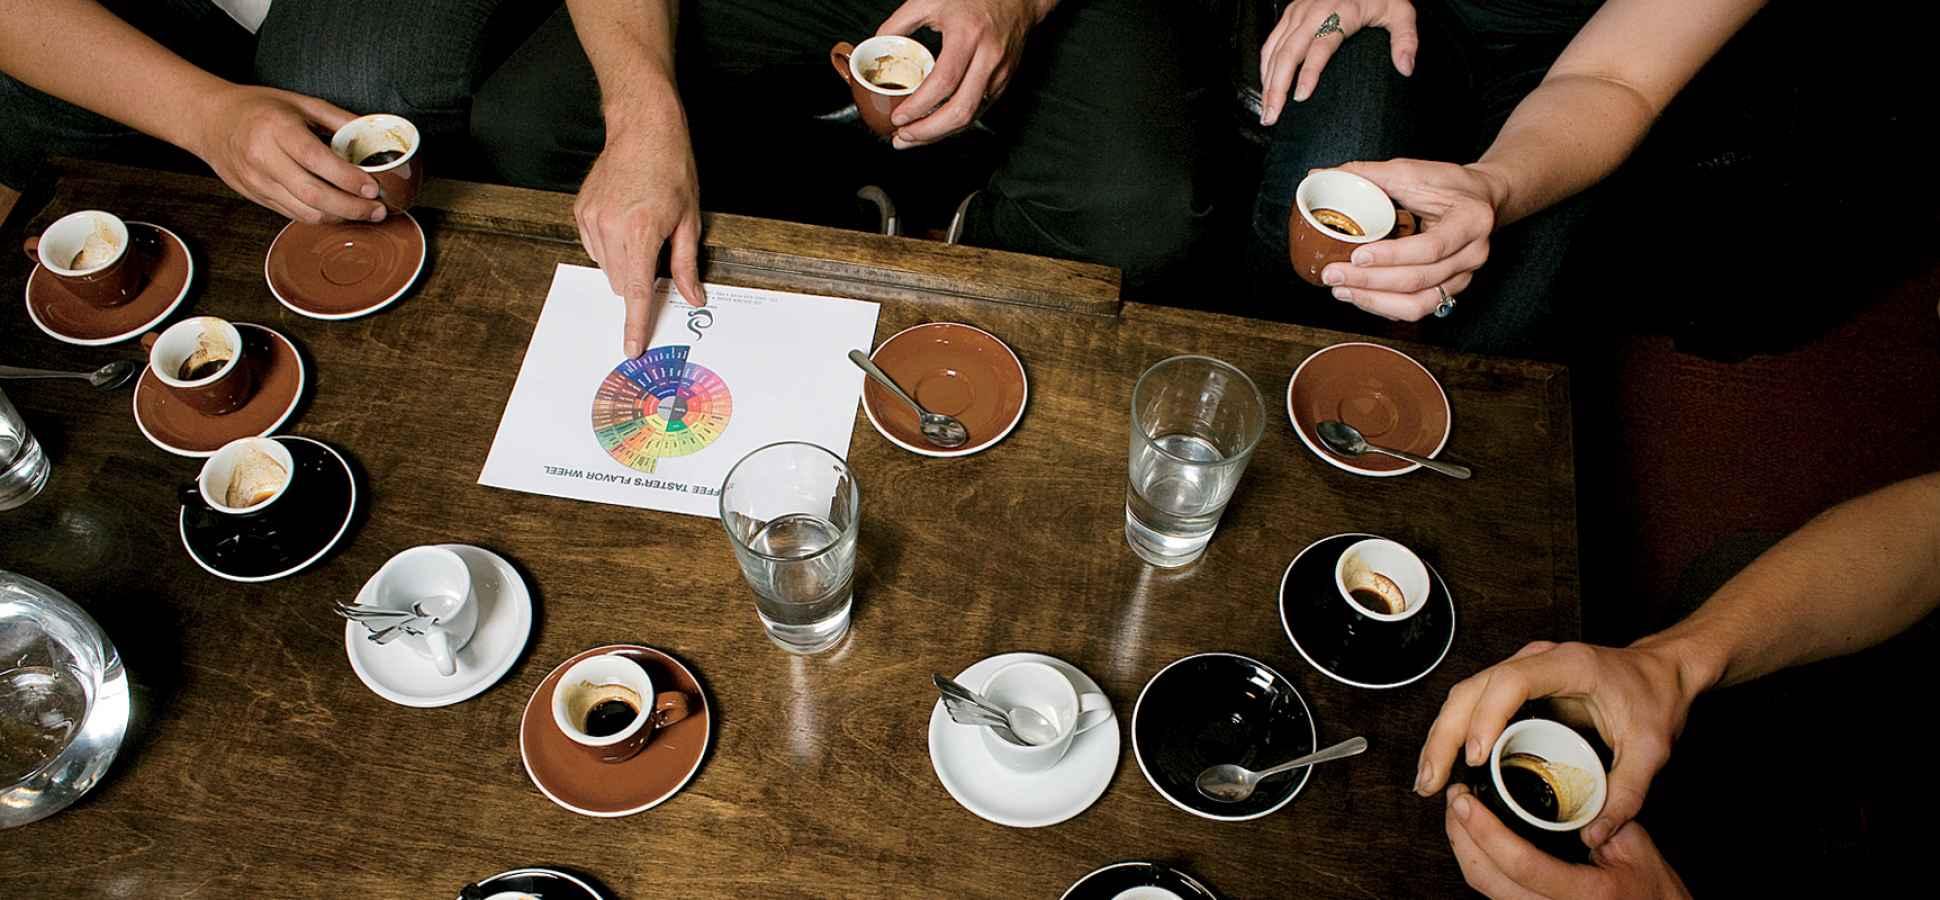 Can Coffee Shop Noises Make You More Creative?